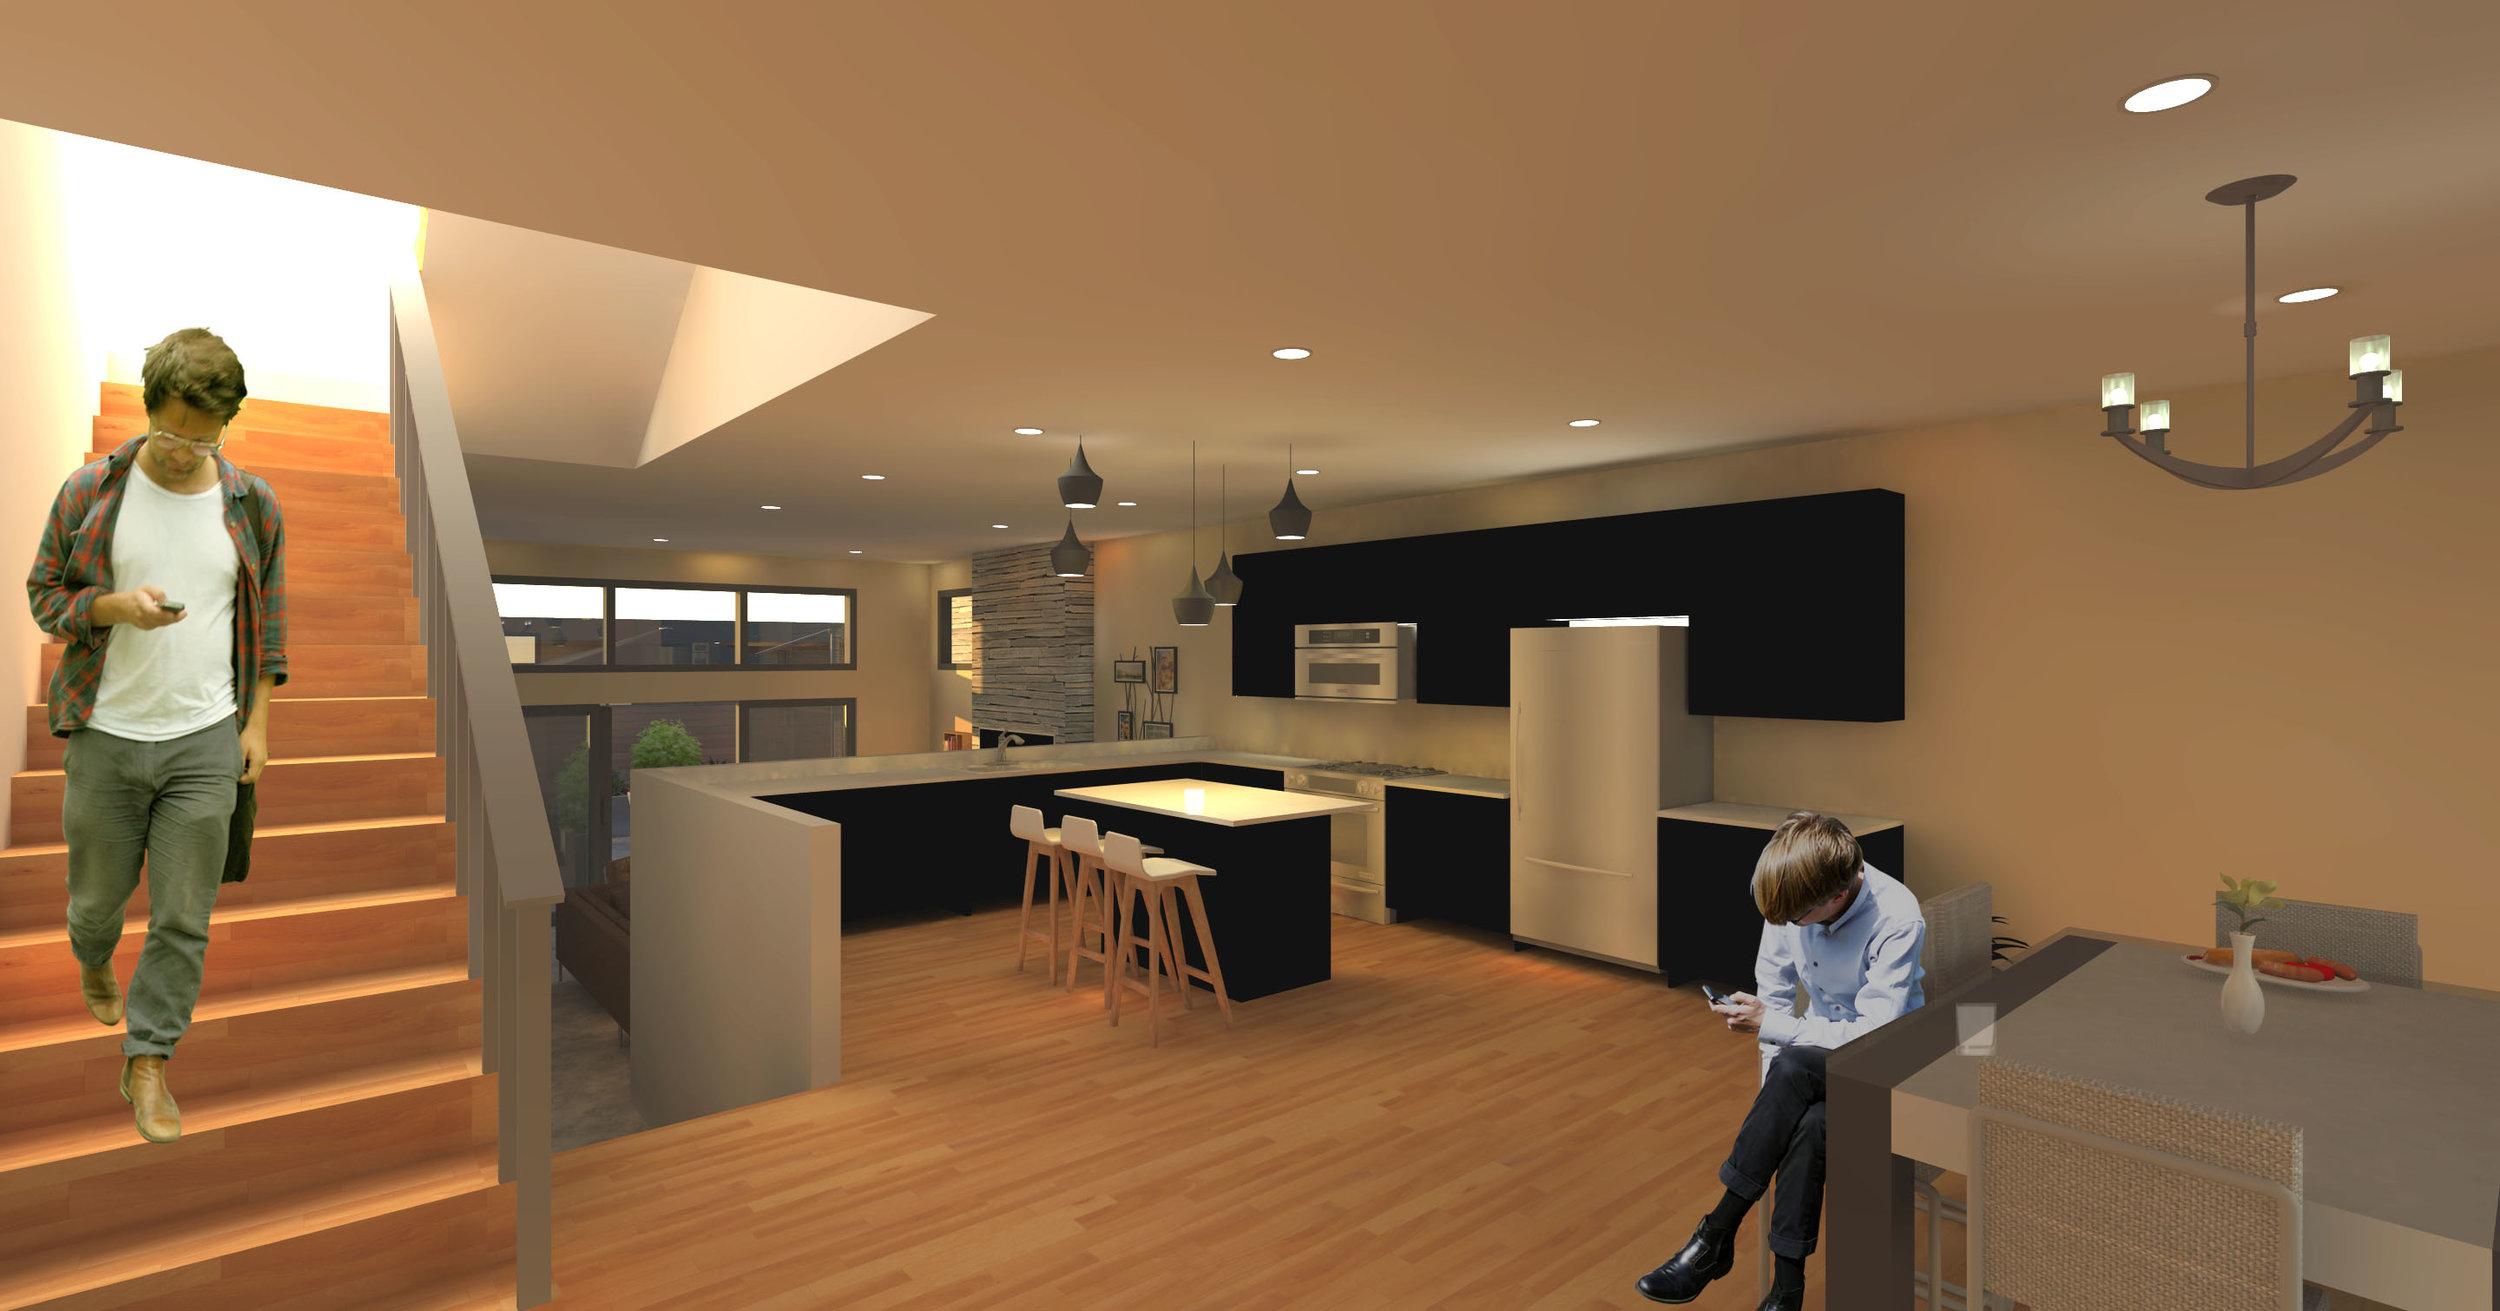 N Euclid Ave kitchen rendering.jpg